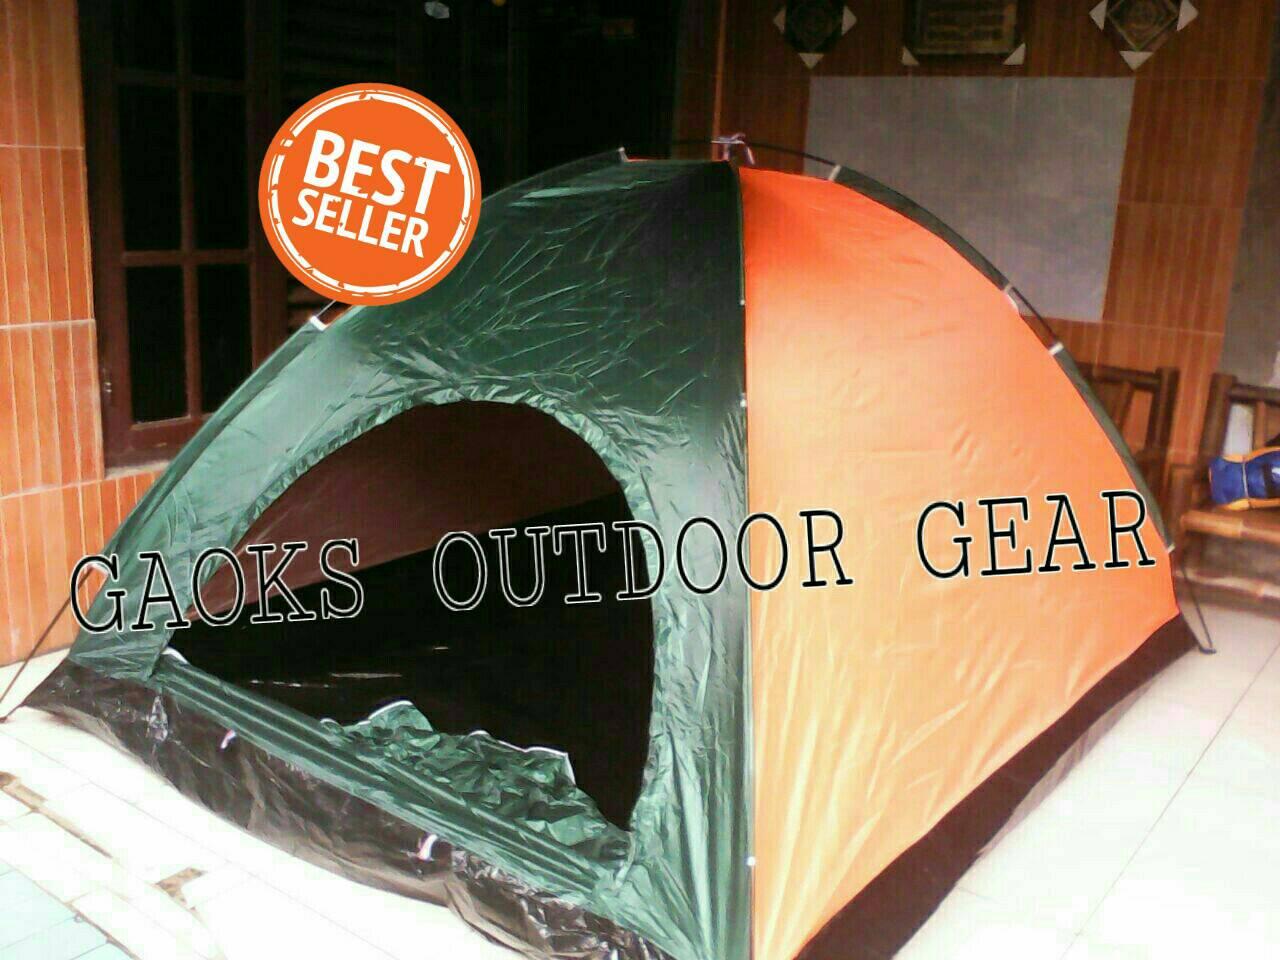 Jual Tenda Dome Hyu Kapasitas 6 7 Orang Single Layer Gaoks Outdoor Gear Tokopedia